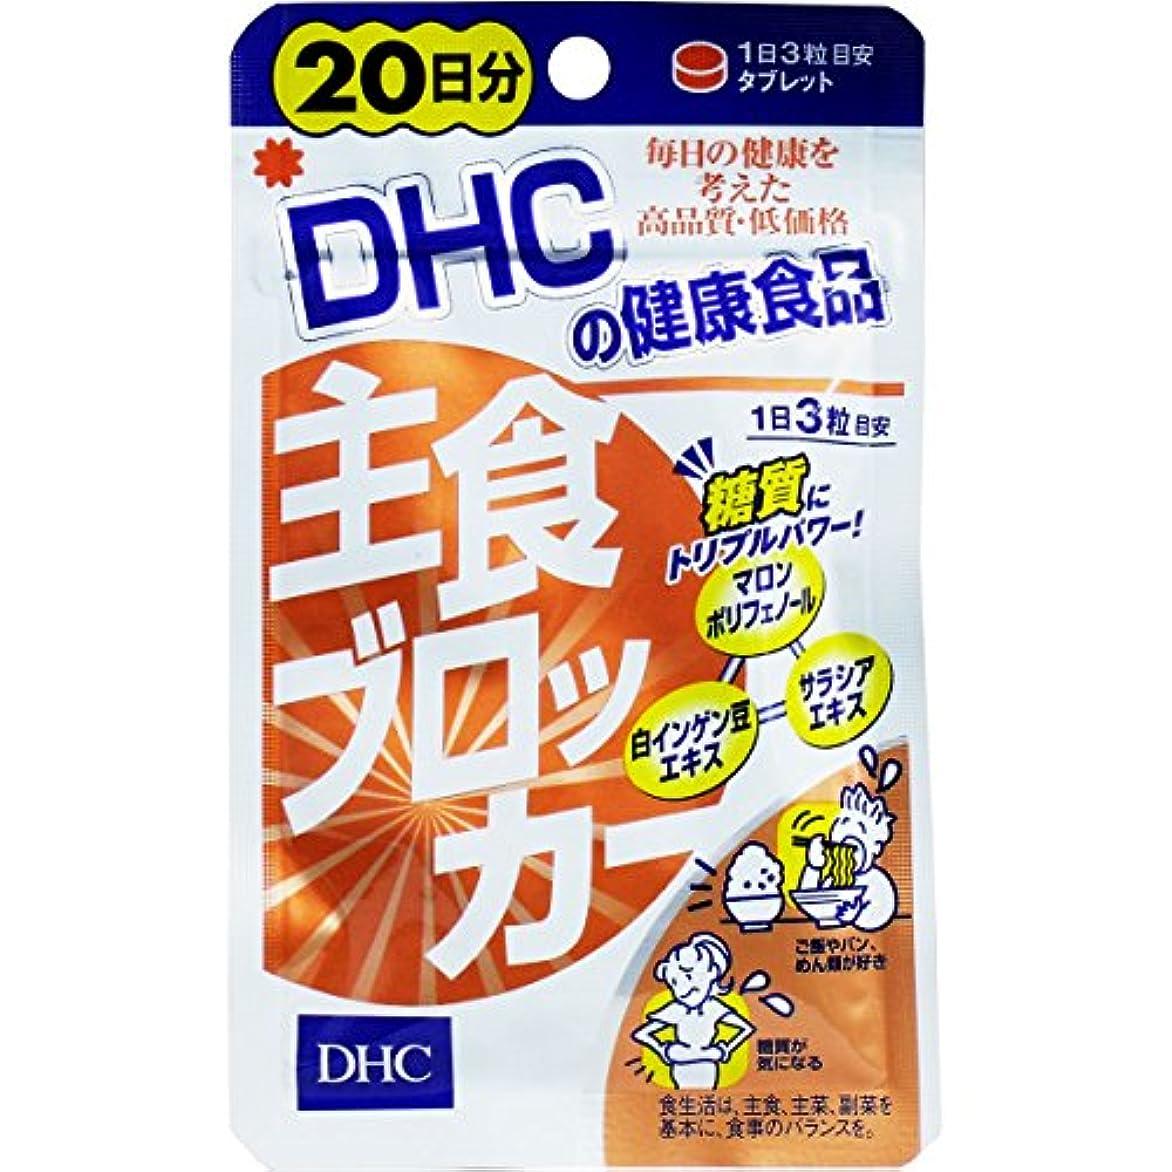 DHC 主食ブロッカー 20日分 60粒(12g) 2個セット